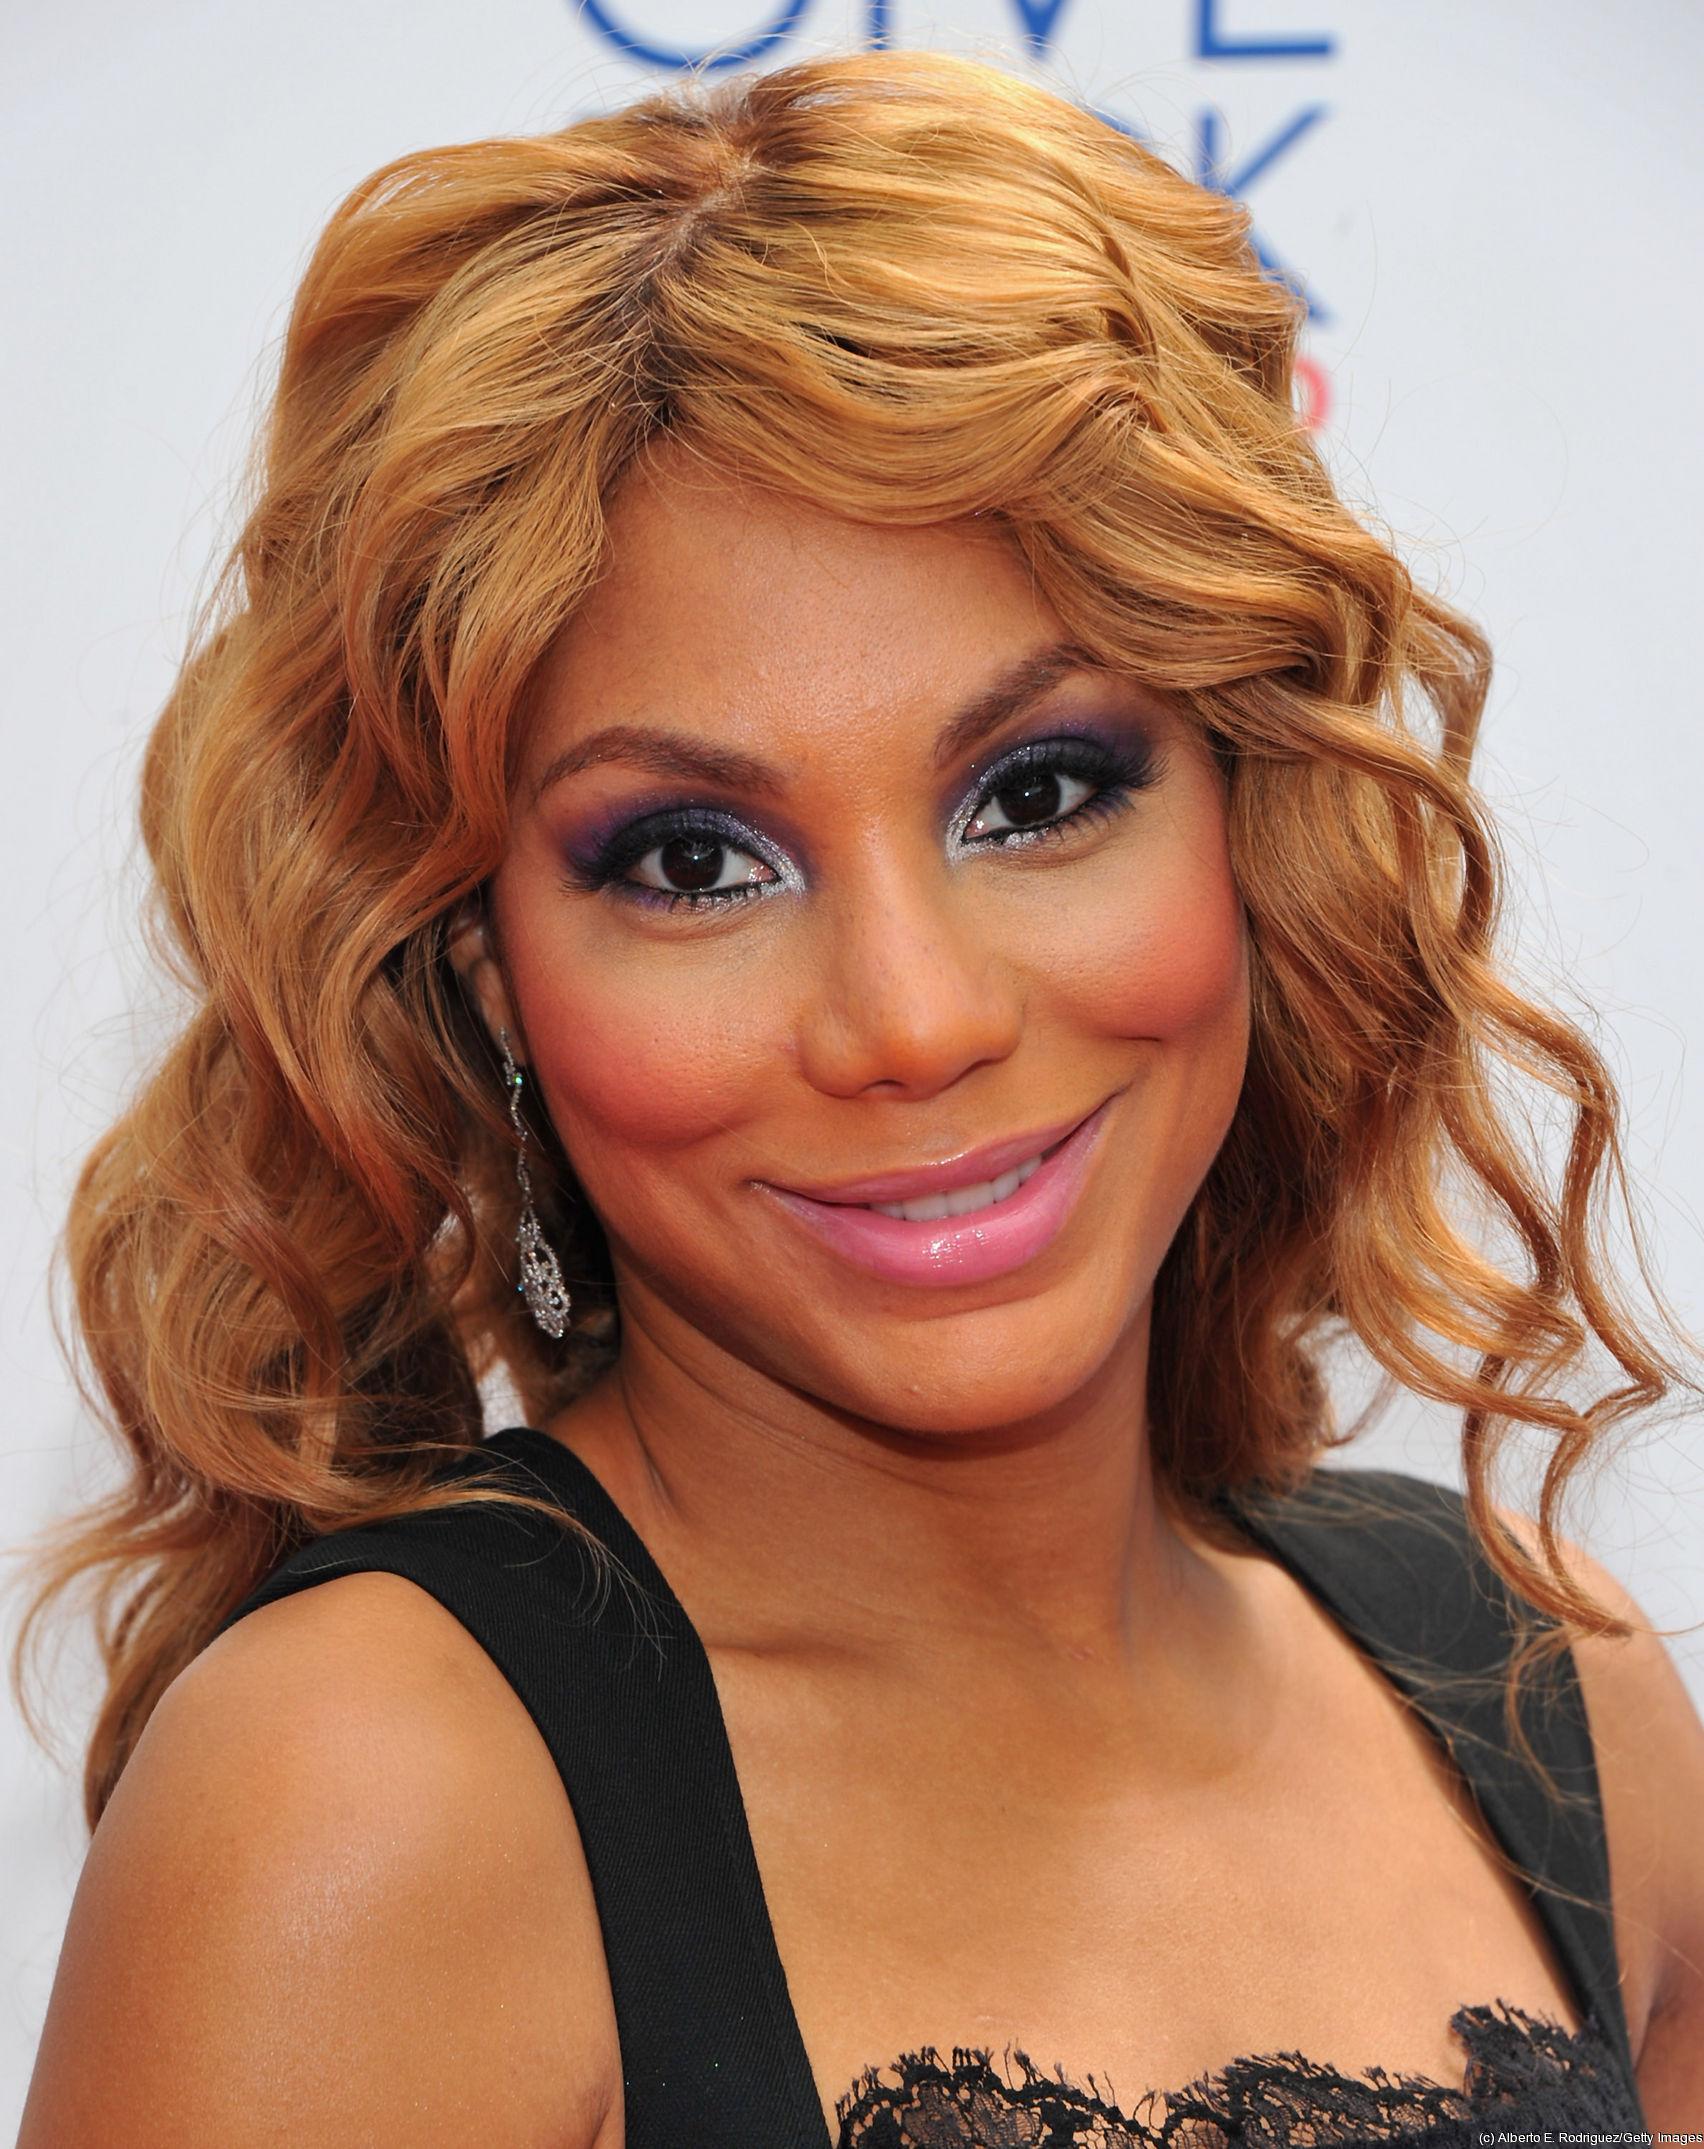 Singer Tamar Braxton - age: 43